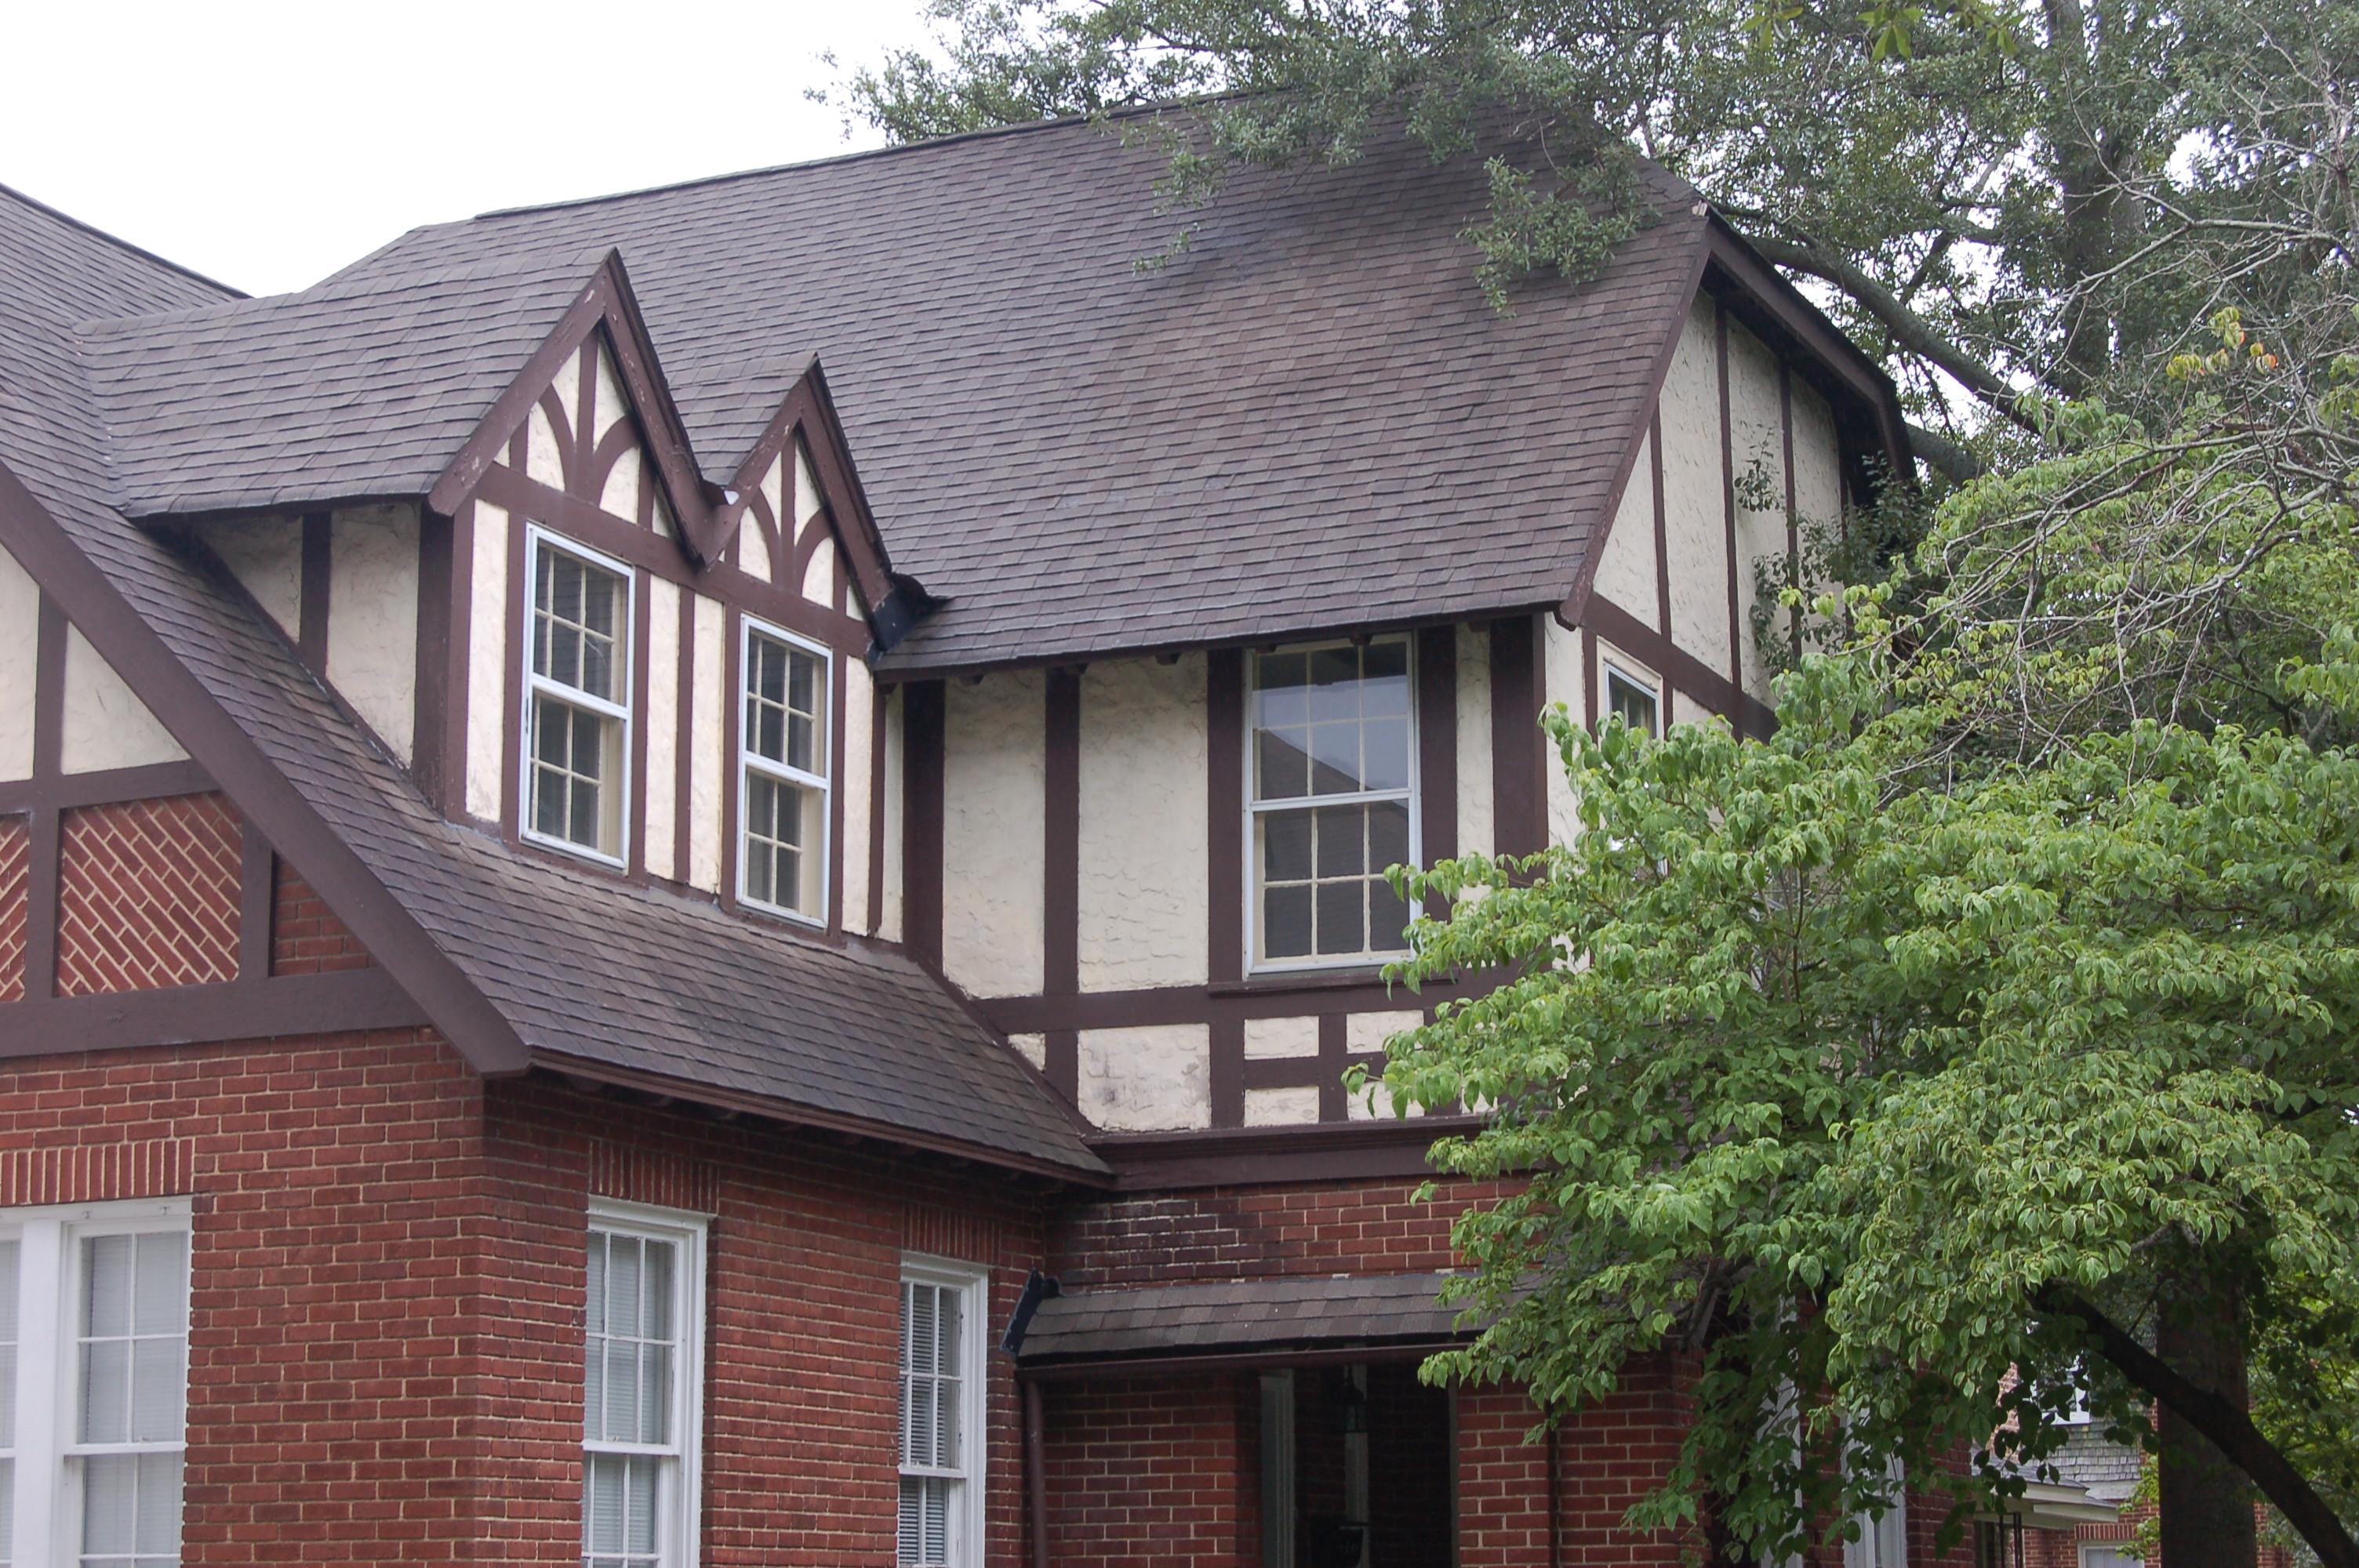 2320 Devine Street,Columbia,South Carolina 29205,Commercial,Devine Street,1066